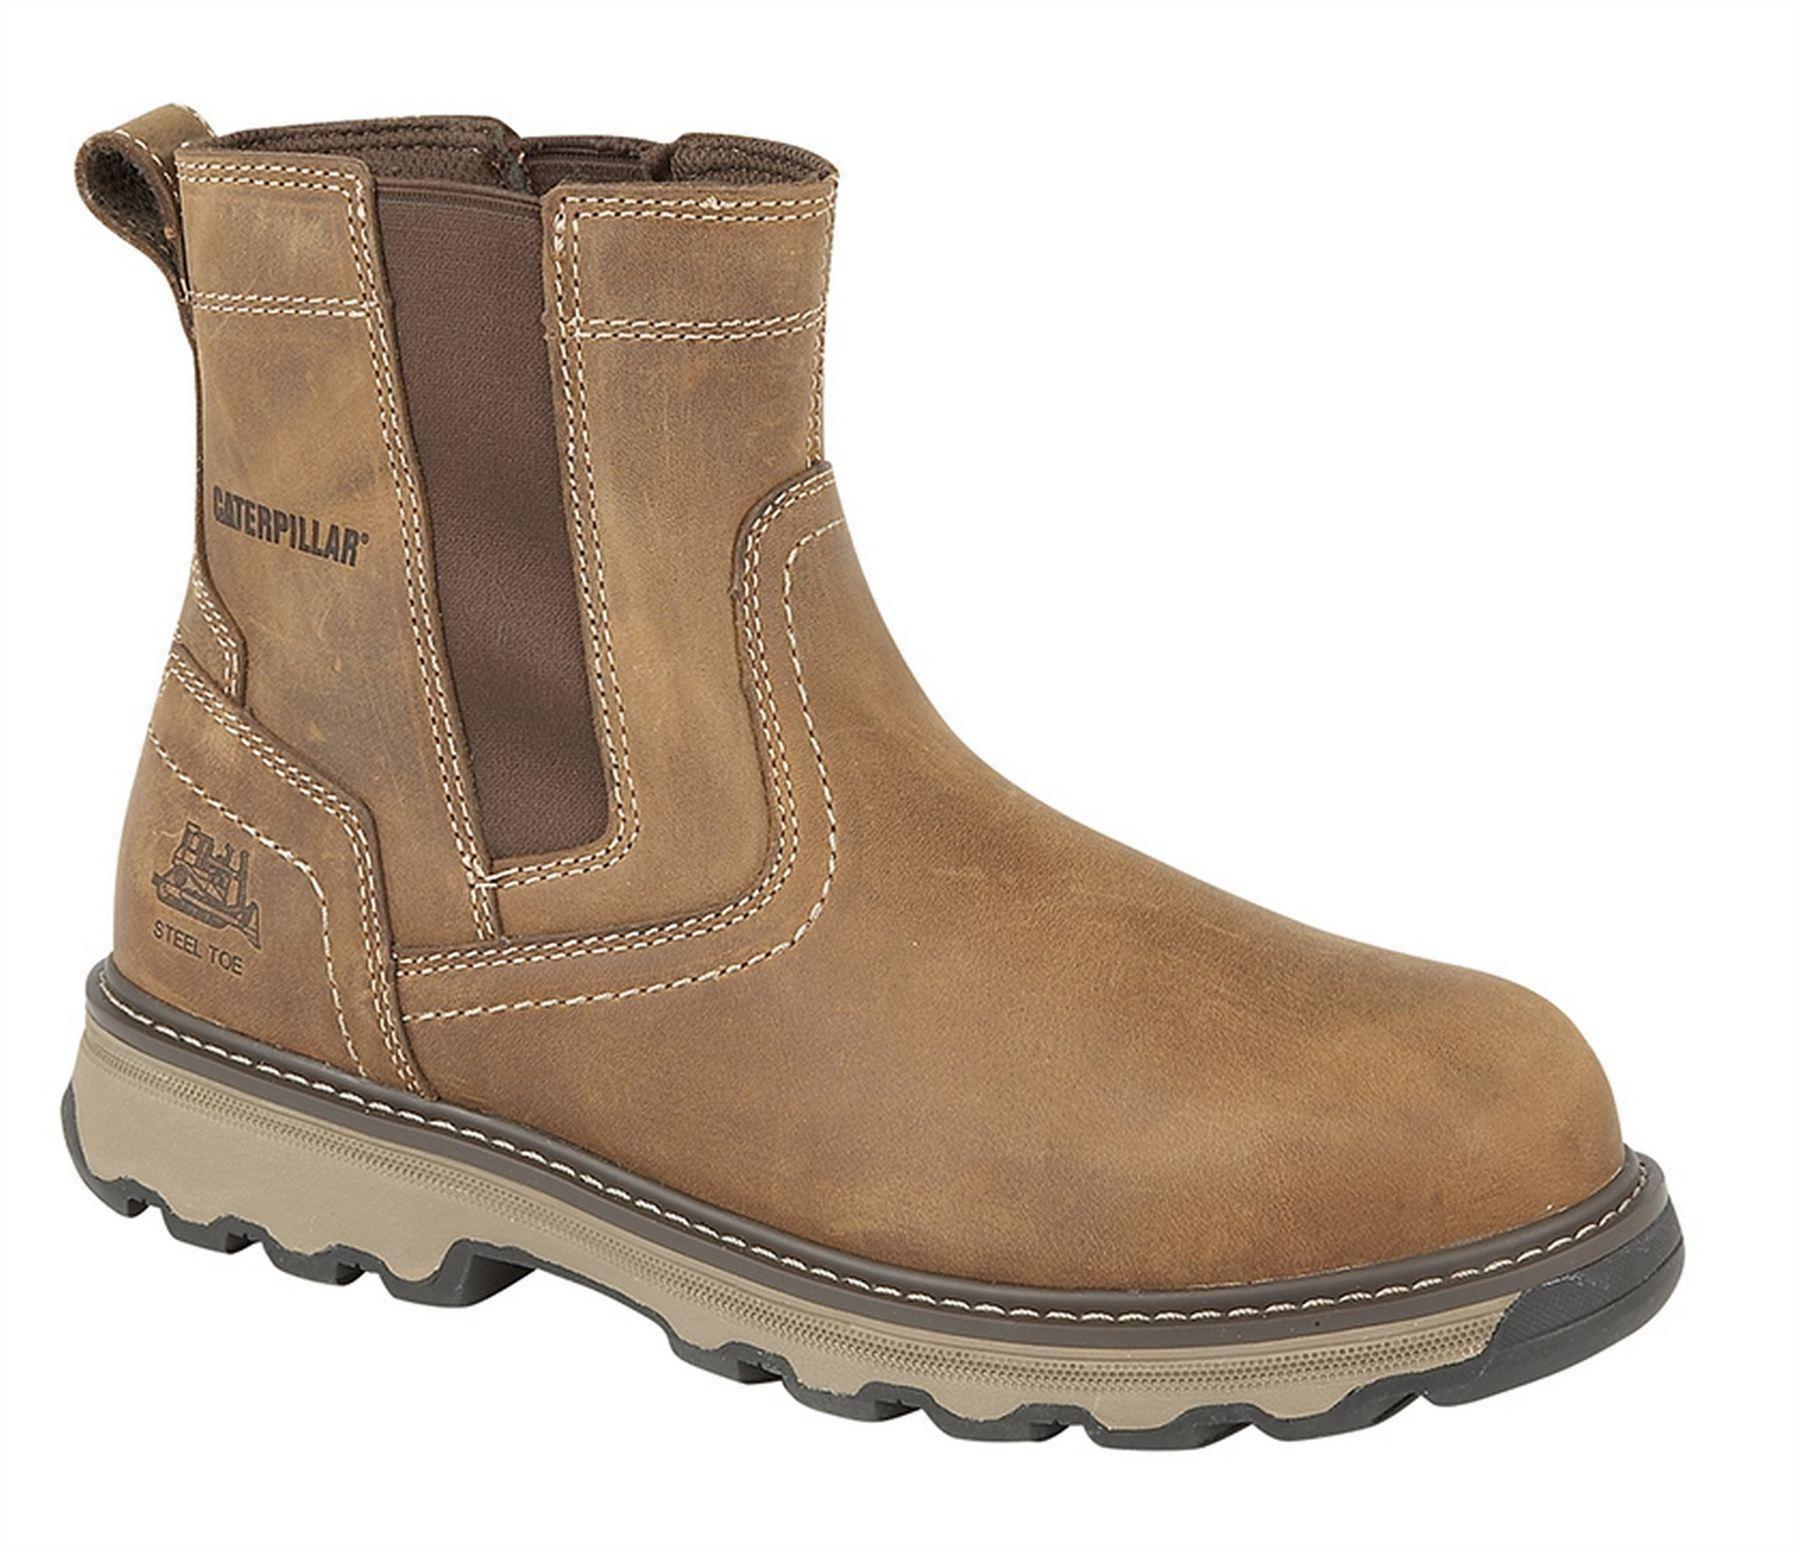 Mens Caterpillar Safety Boots